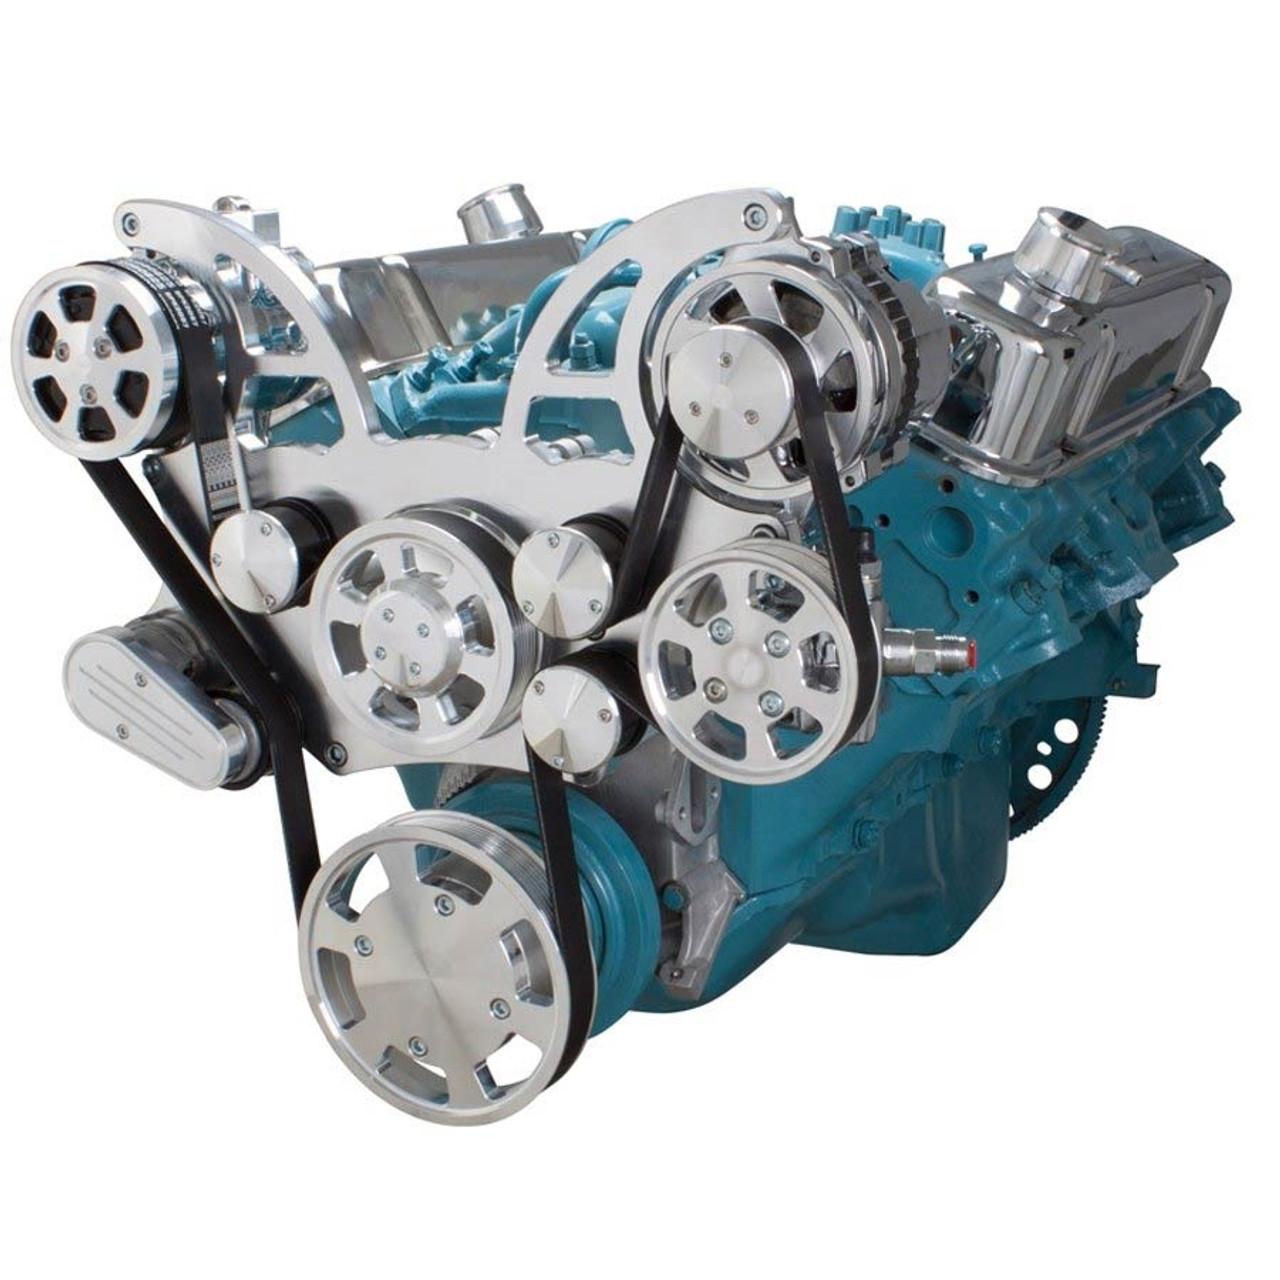 hight resolution of serpentine conversion kit for pontiac 350 400 428 455 v8 engines 2001 lexus is300 engine diagram pontiac 350 engine diagram